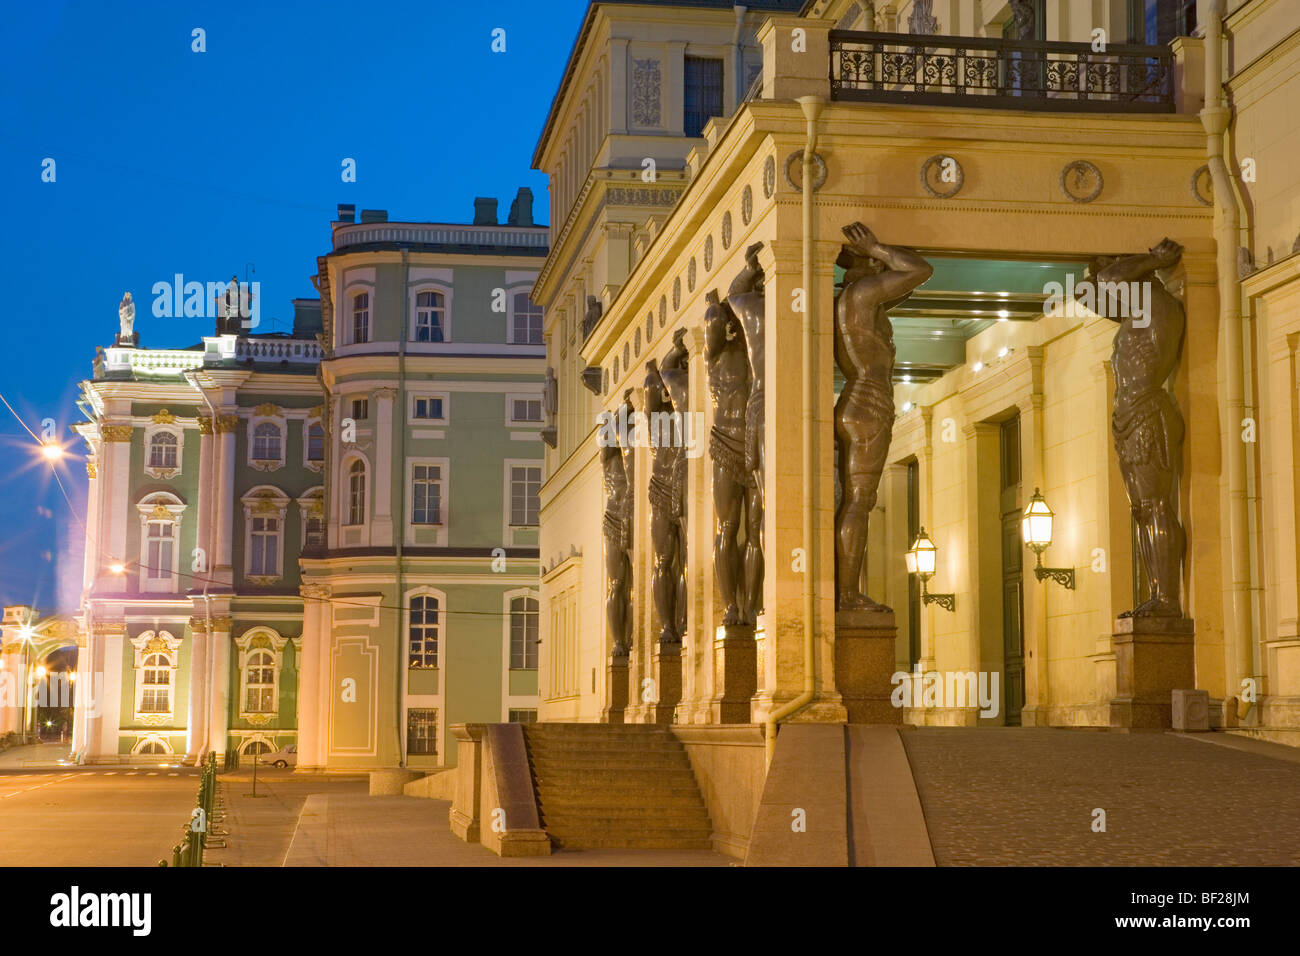 Portikus of the New Hermitage, Saint Petersburg, Russia - Stock Image